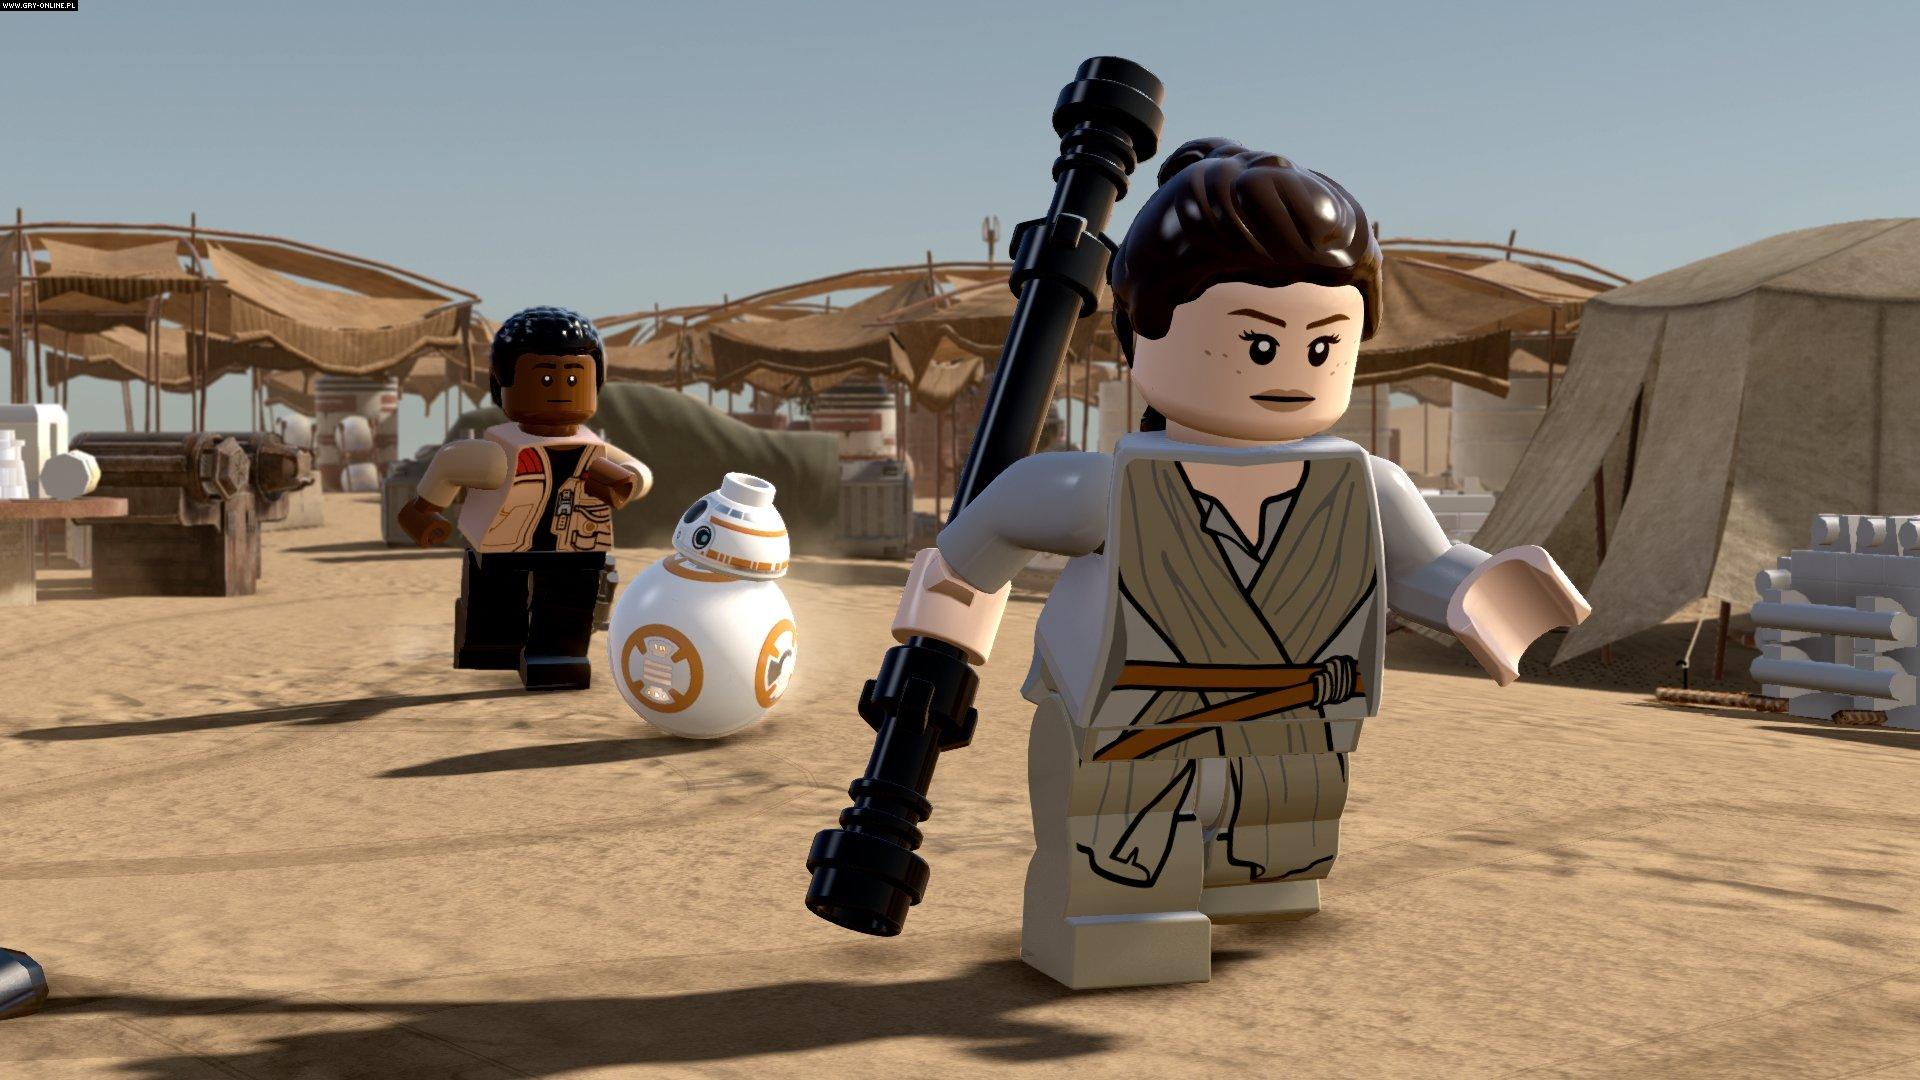 LEGO Star Wars The Force Awakens mac free